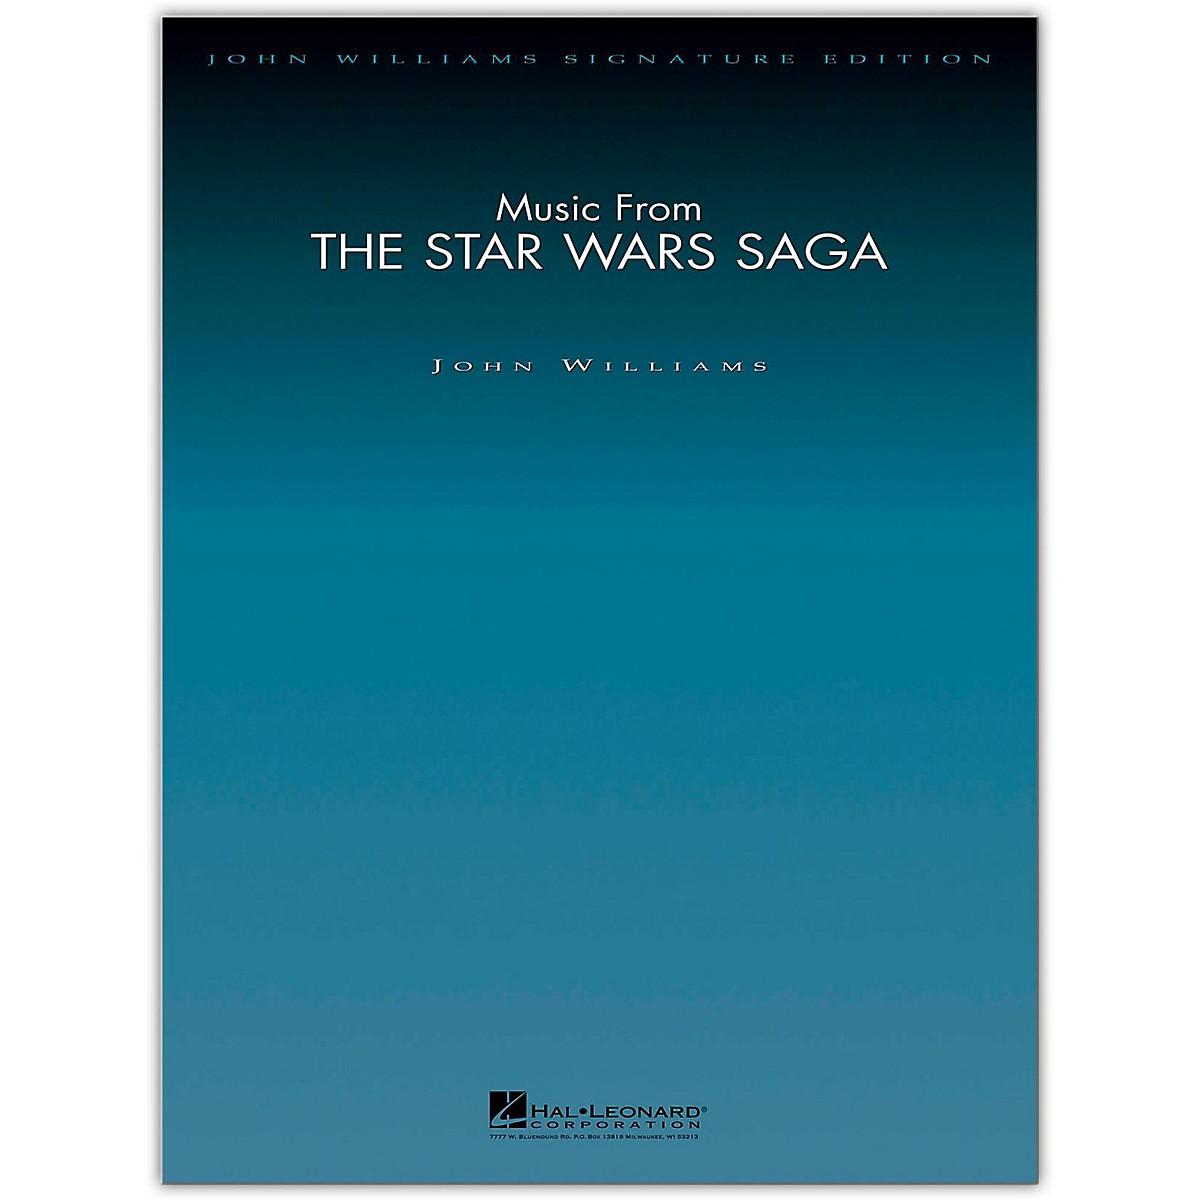 Hal Leonard Music from the Star Wars Saga - John Williams Signature Edition Orchestra Deluxe Score